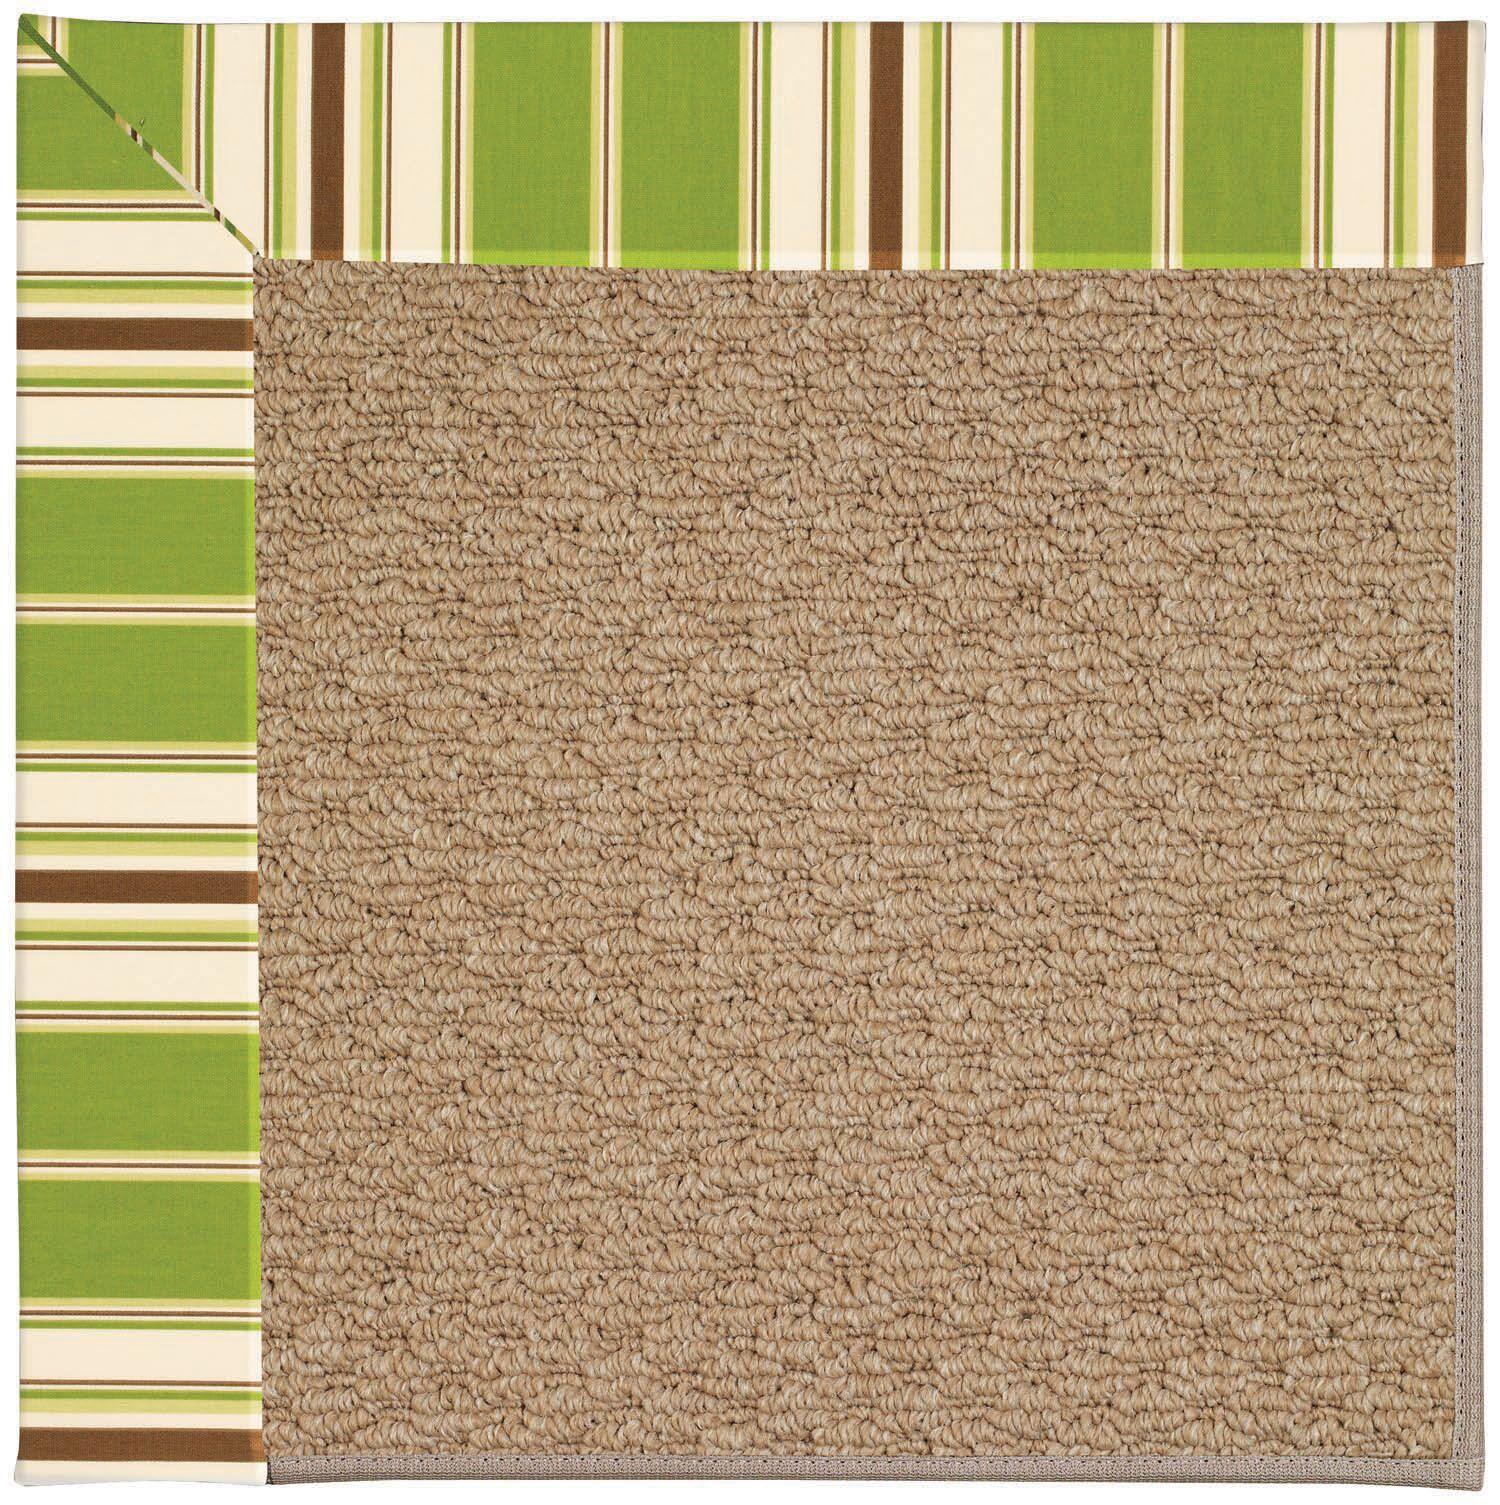 Lisle Machine Woven Indoor/Outdoor Area Rug Rug Size: Rectangle 7' x 9'